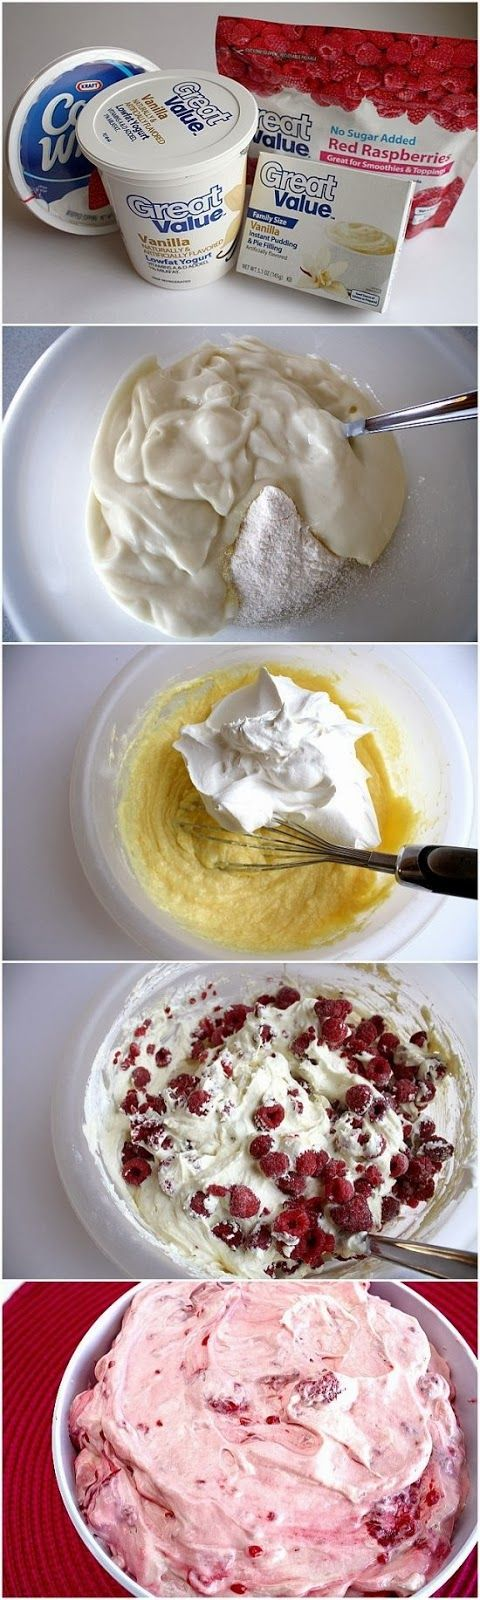 RASPBERRY VANILLA JELLO SALAD. Maybe with lemon pudding and yogurt and blueberries or strawberries?  Yum!